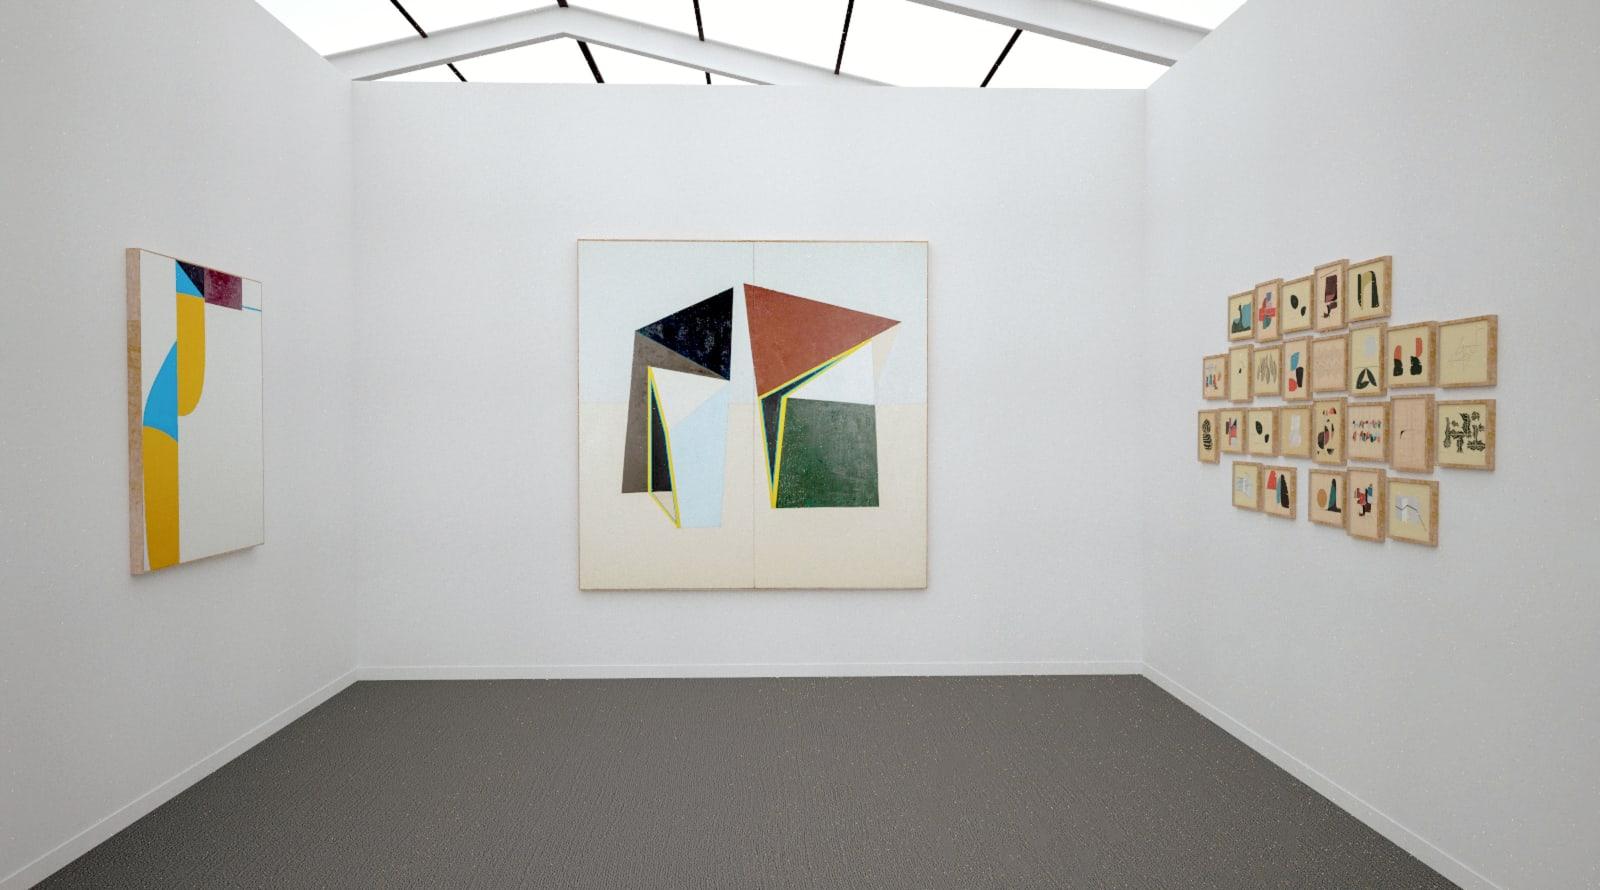 Works by Clare Rojas at Frieze Art Fair New York (Installation View), 2020, Kavi Gupta